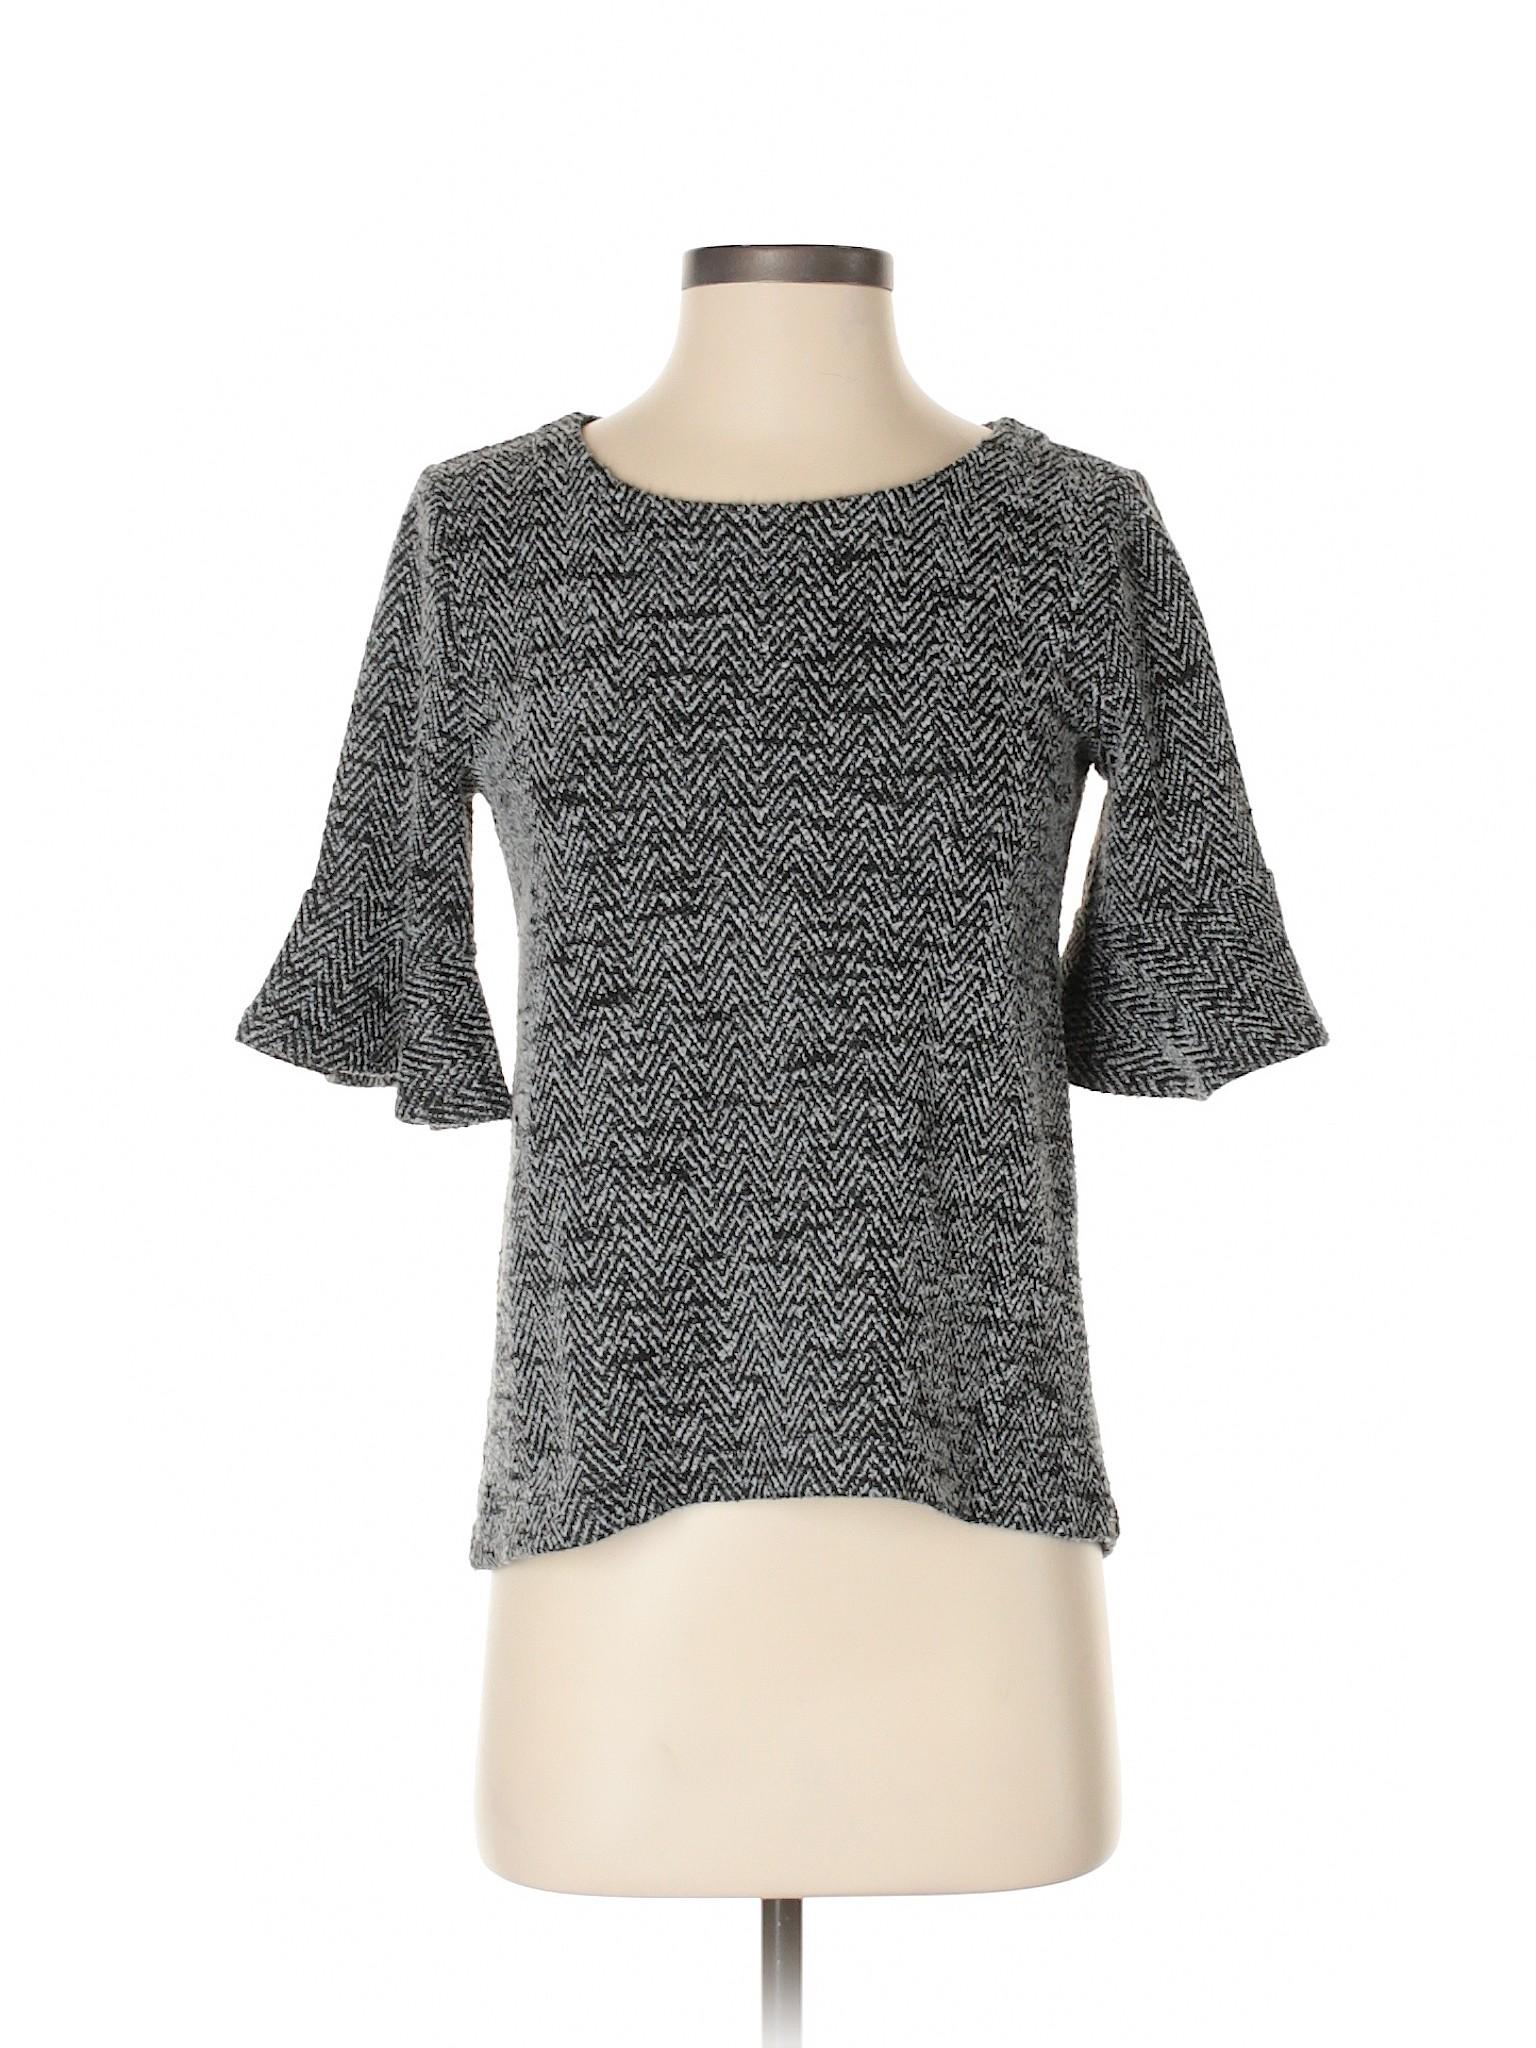 LOFT Pullover Sweater Taylor Ann Boutique winter qPUt77